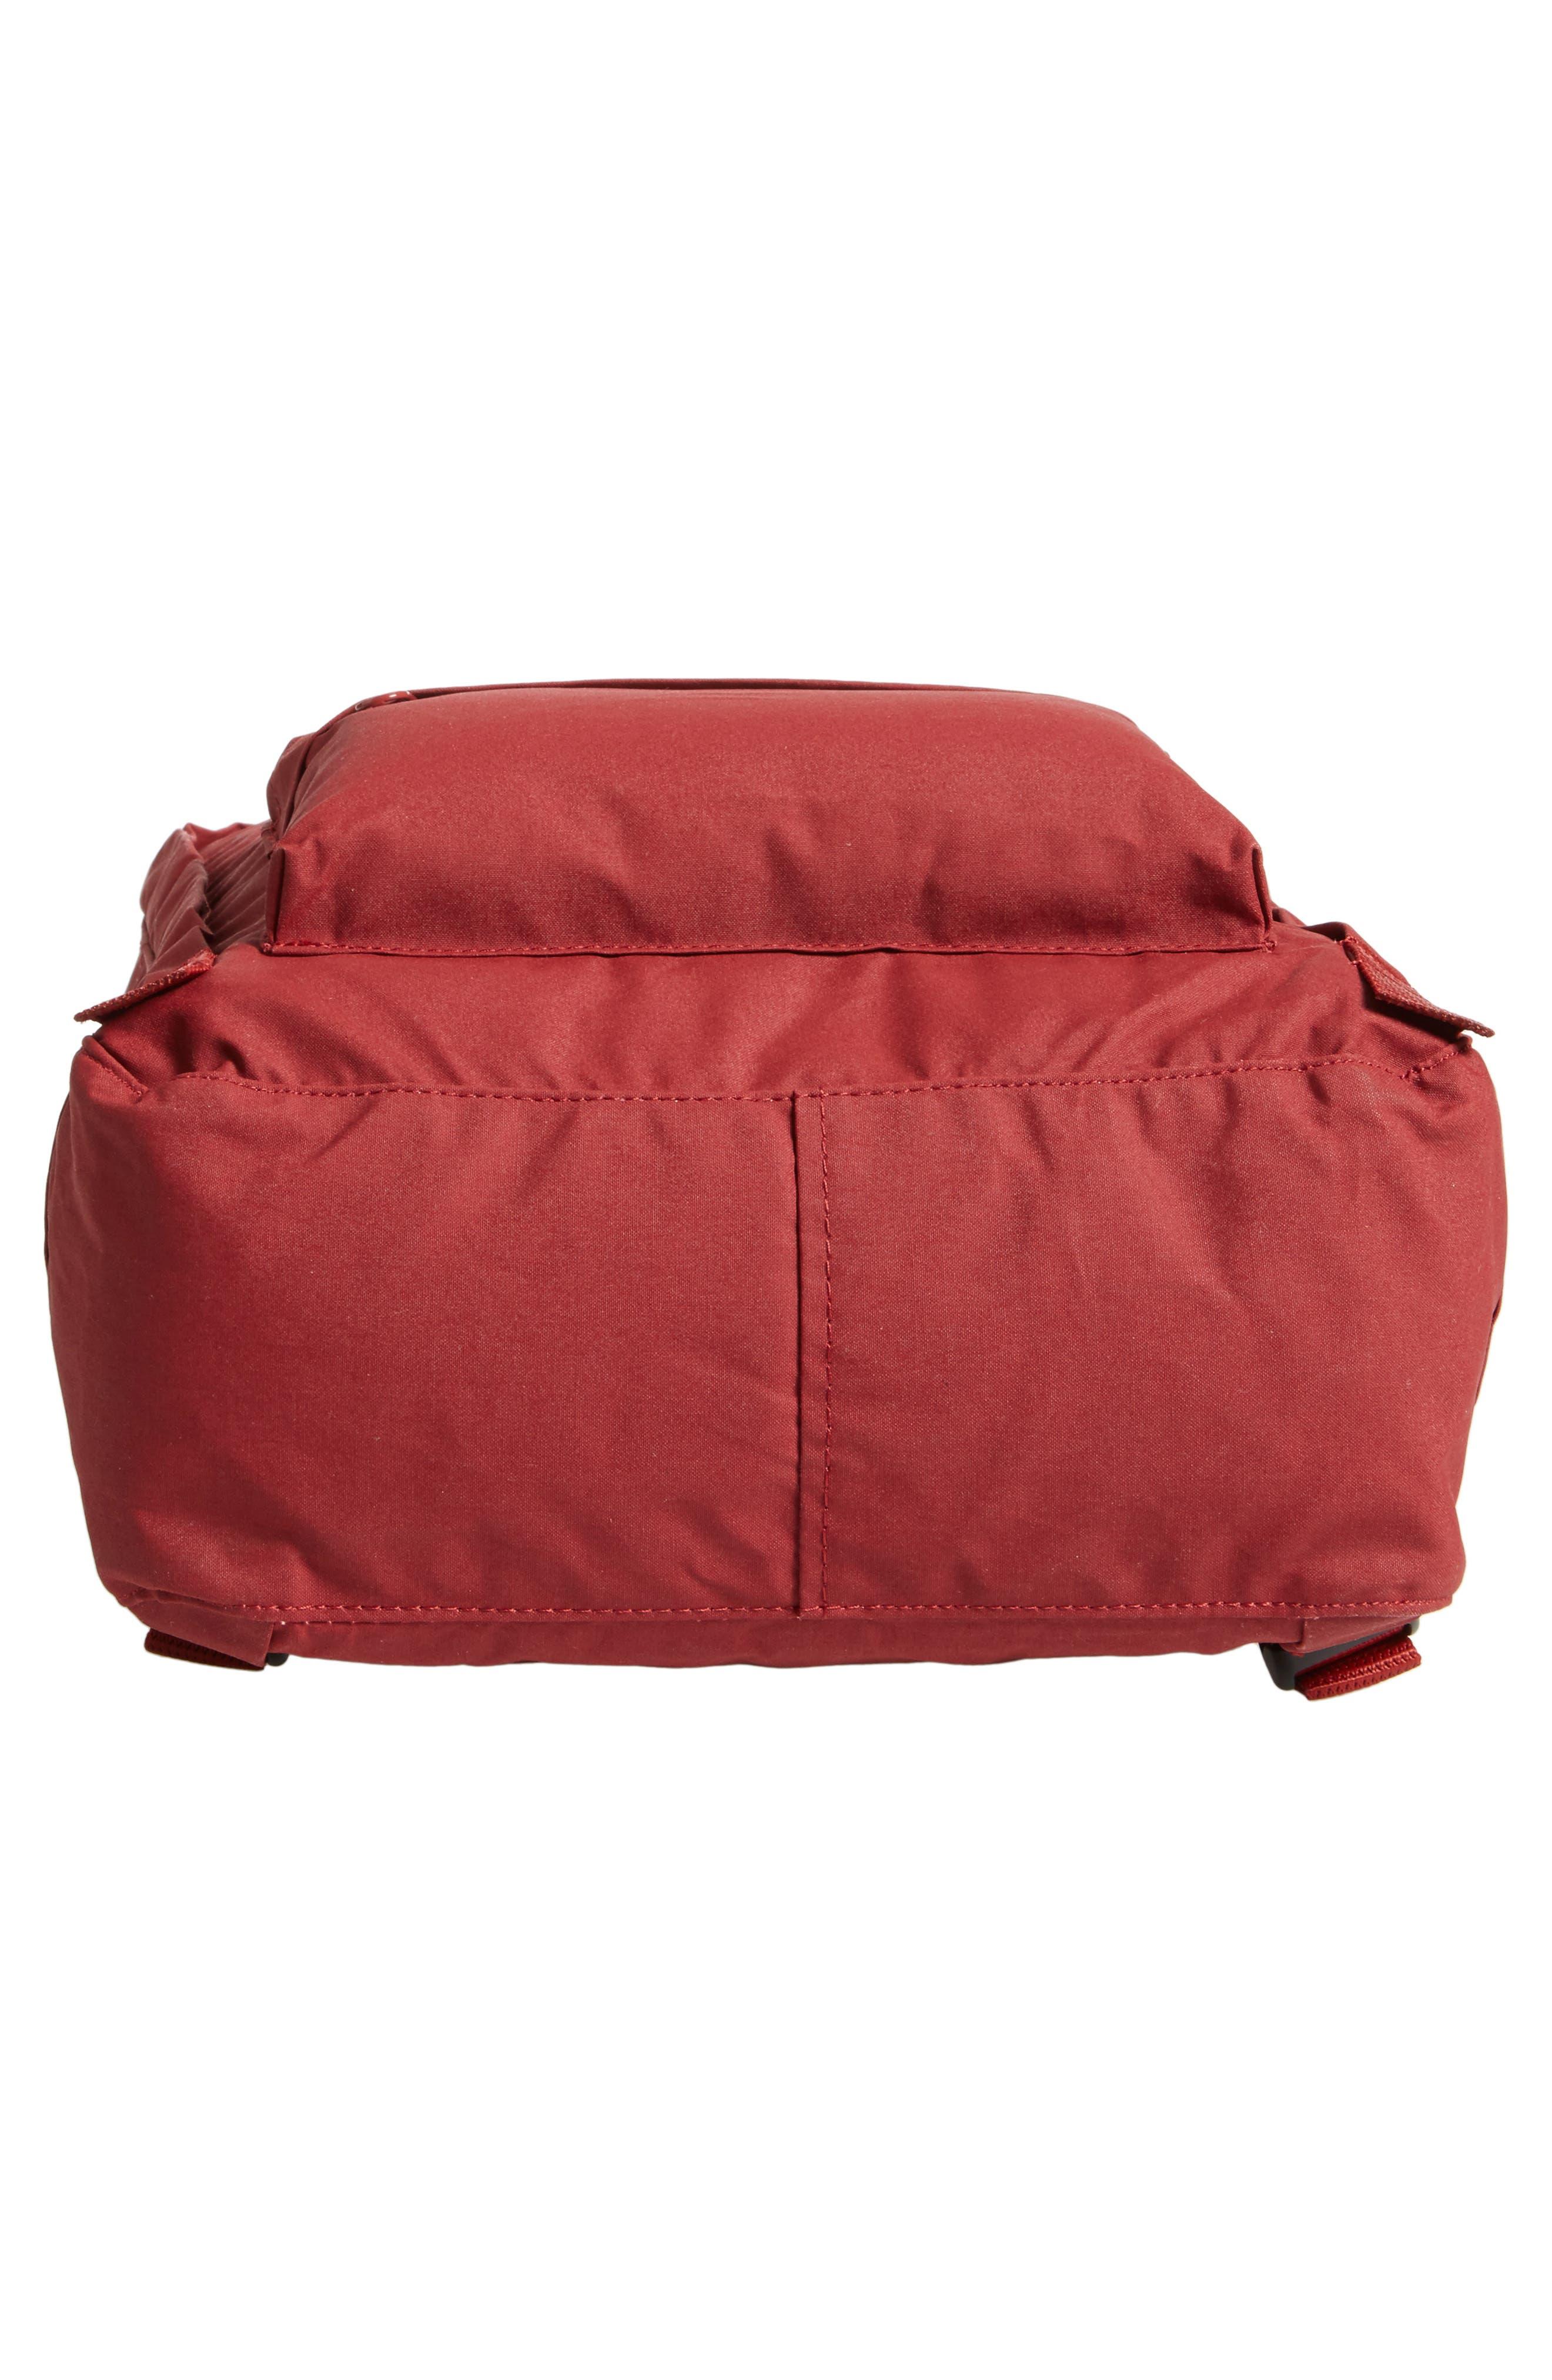 'Kånken' Water Resistant Backpack,                             Alternate thumbnail 358, color,